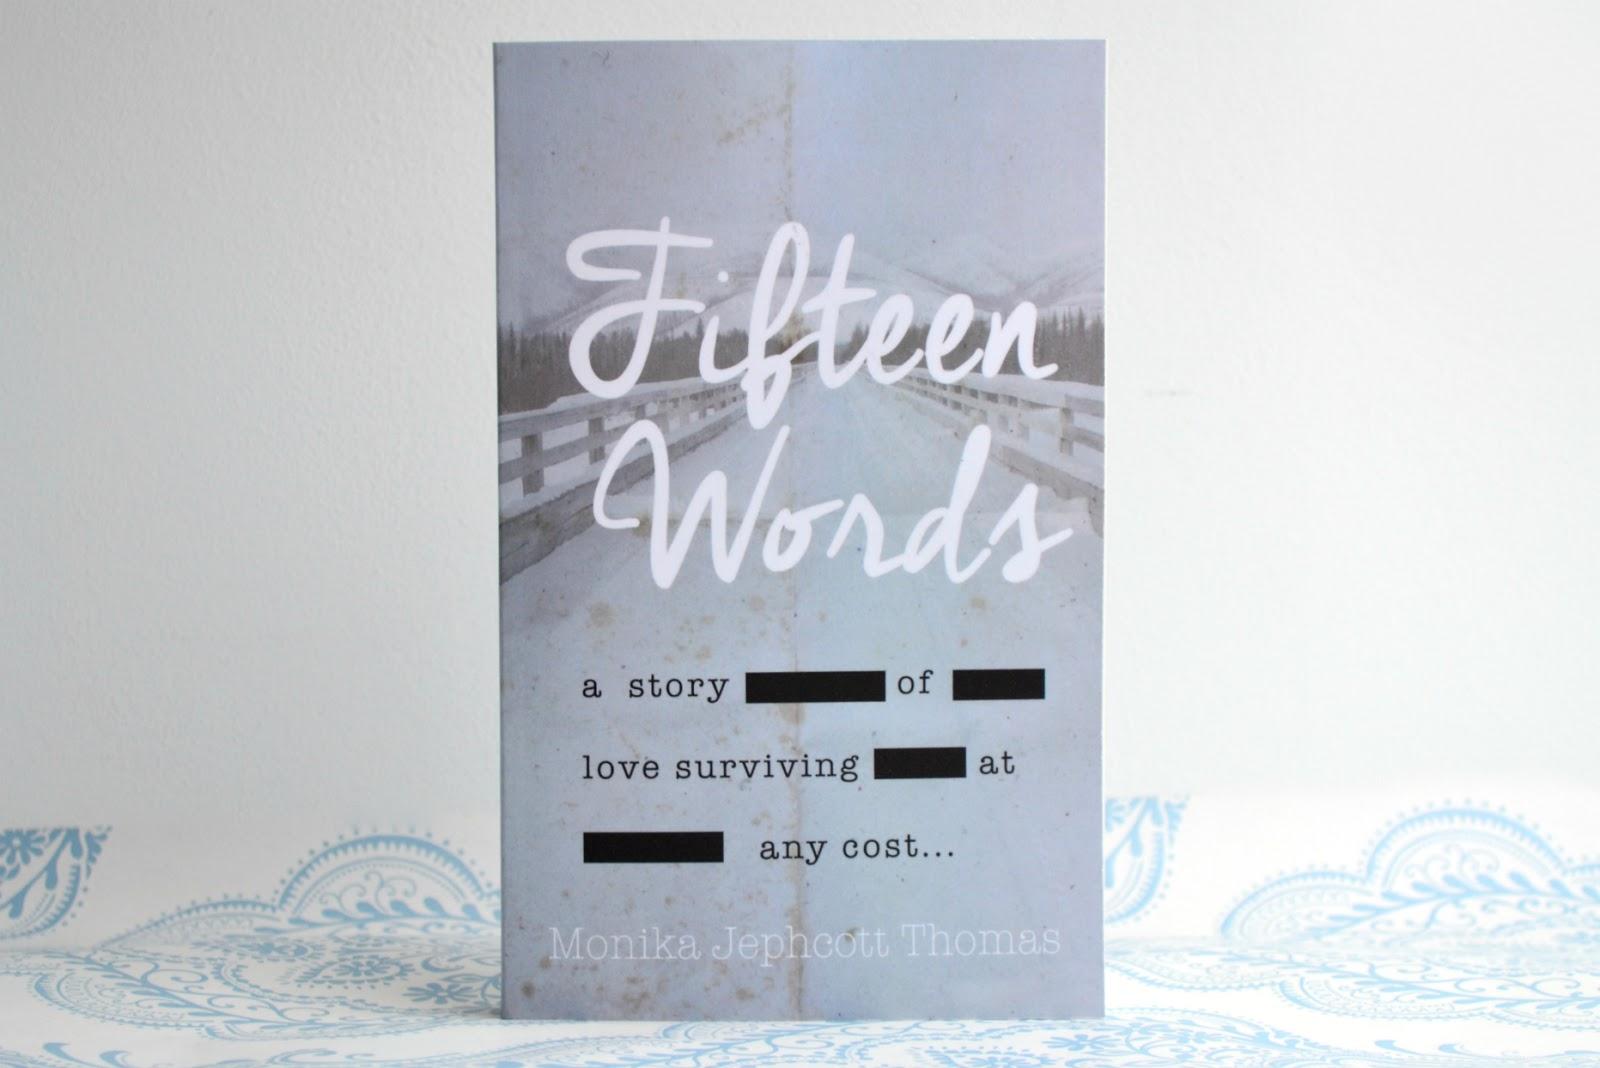 Fifteen Words by Monika Jephcott Thomas